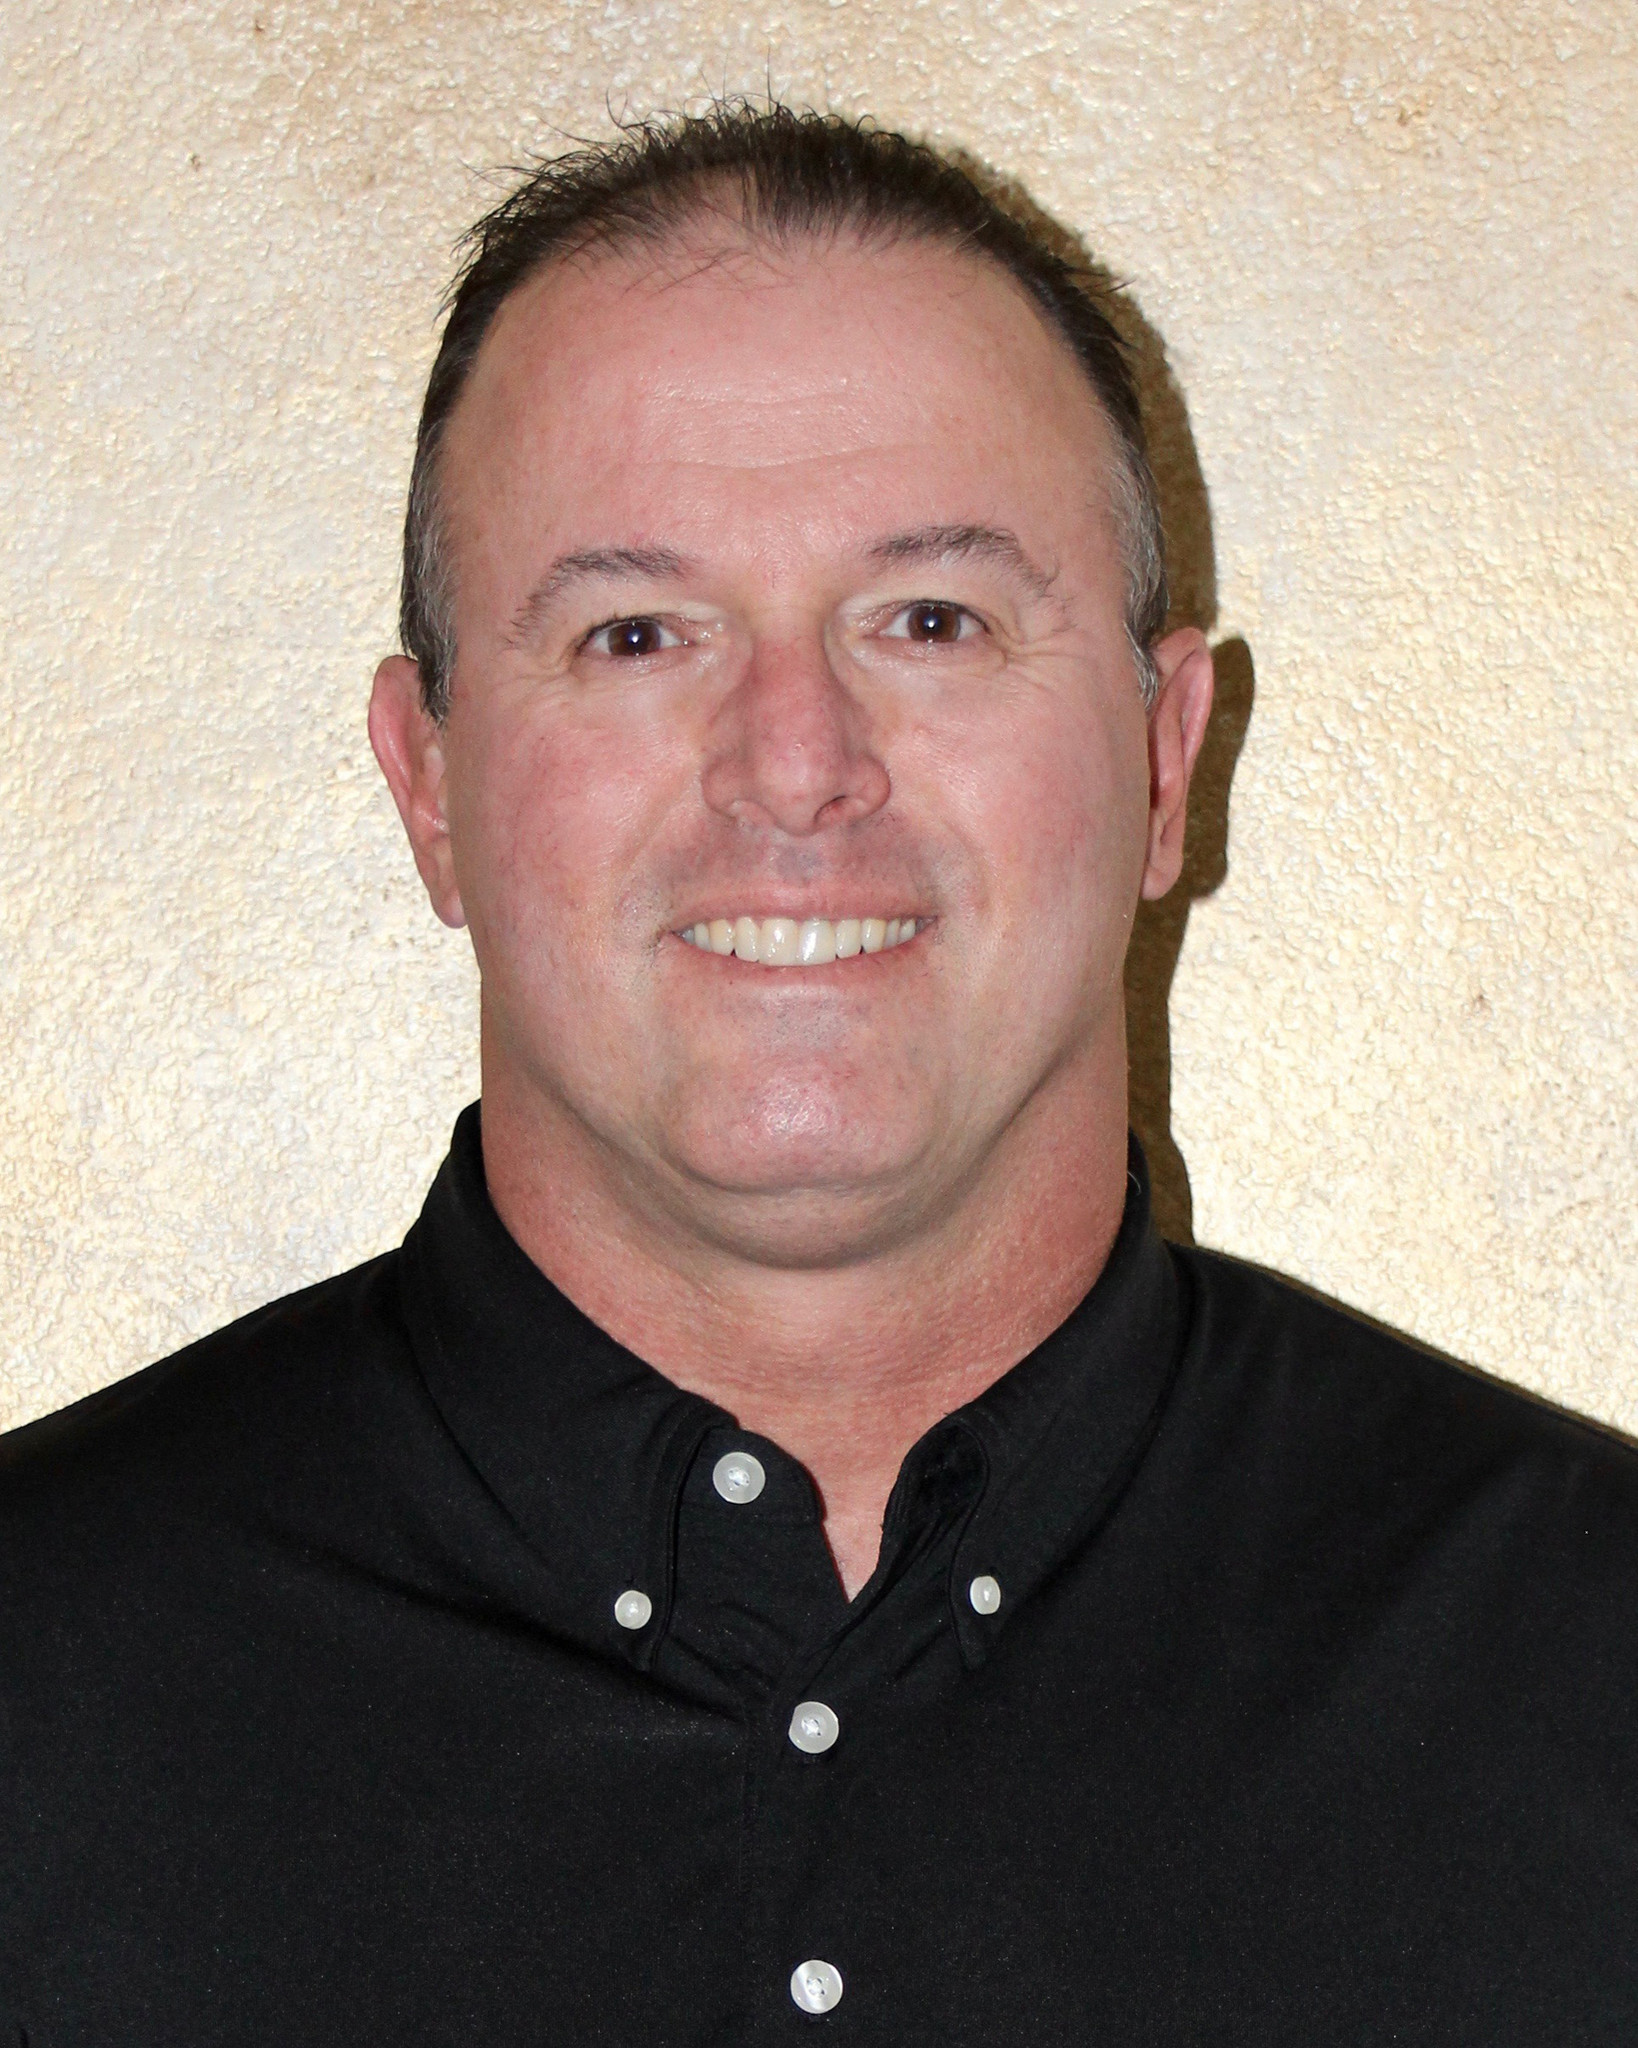 Brad Hollingsworth